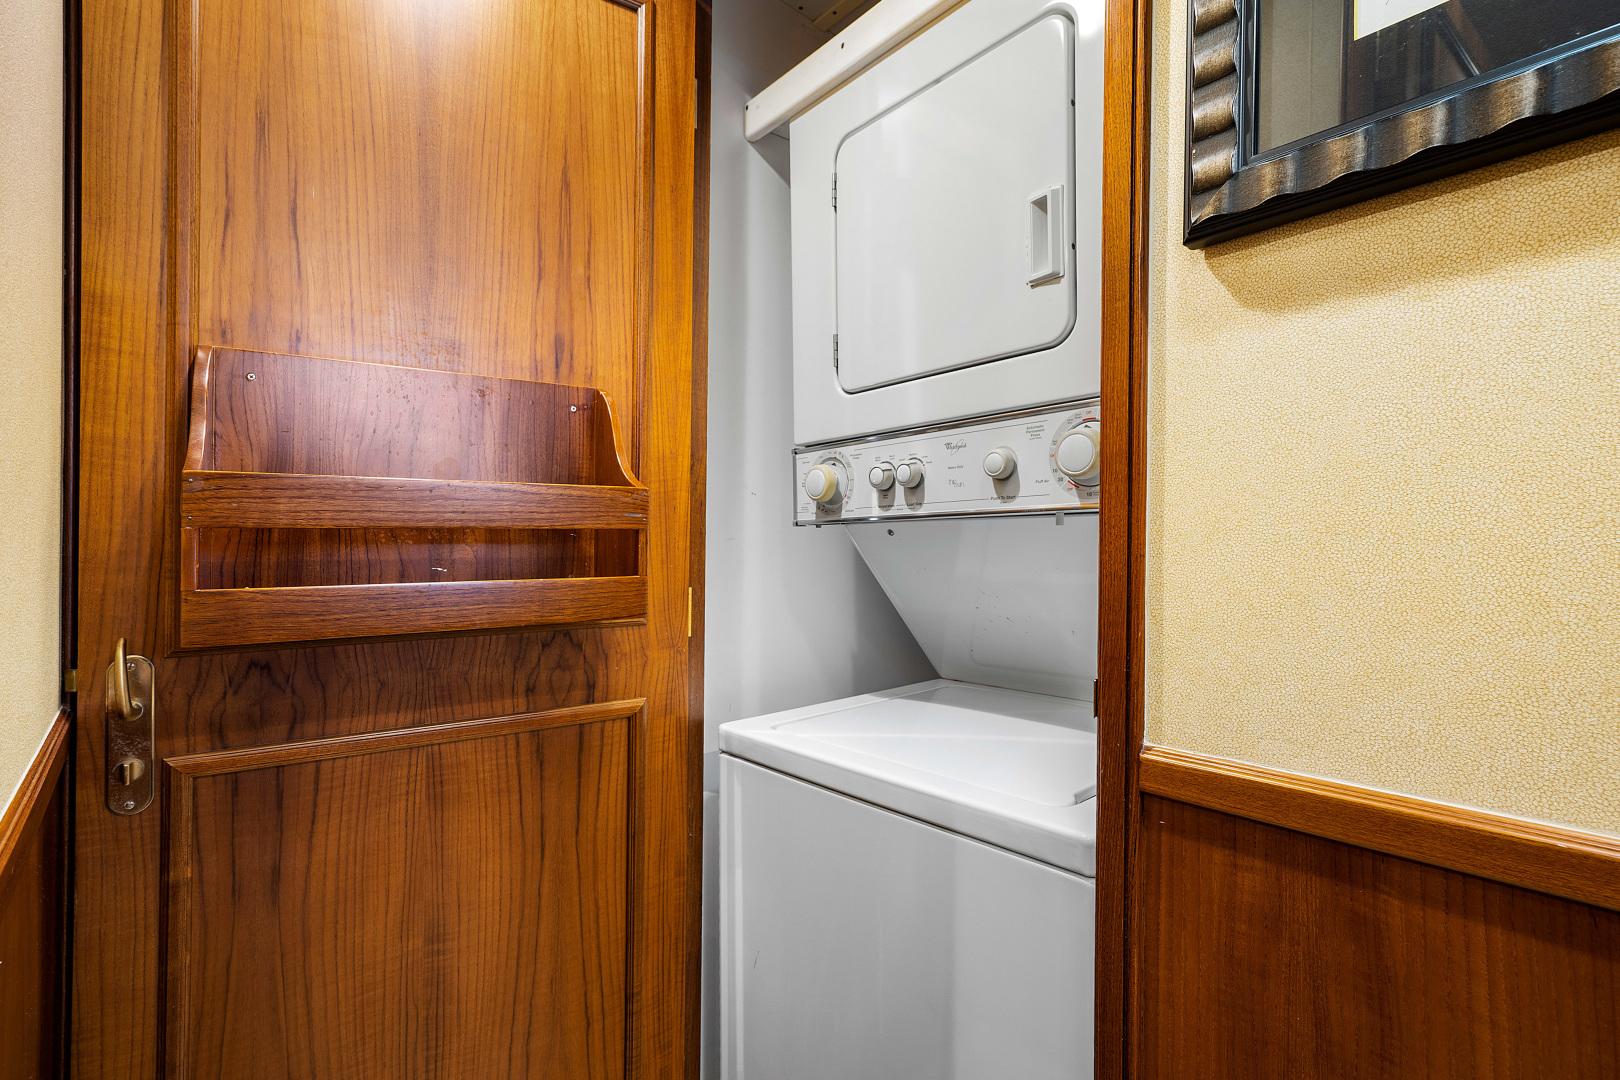 Garlington-Convertible 2003-Reel Lax Jupiter-Florida-United States-Washer/Dryer-1349048 | Thumbnail